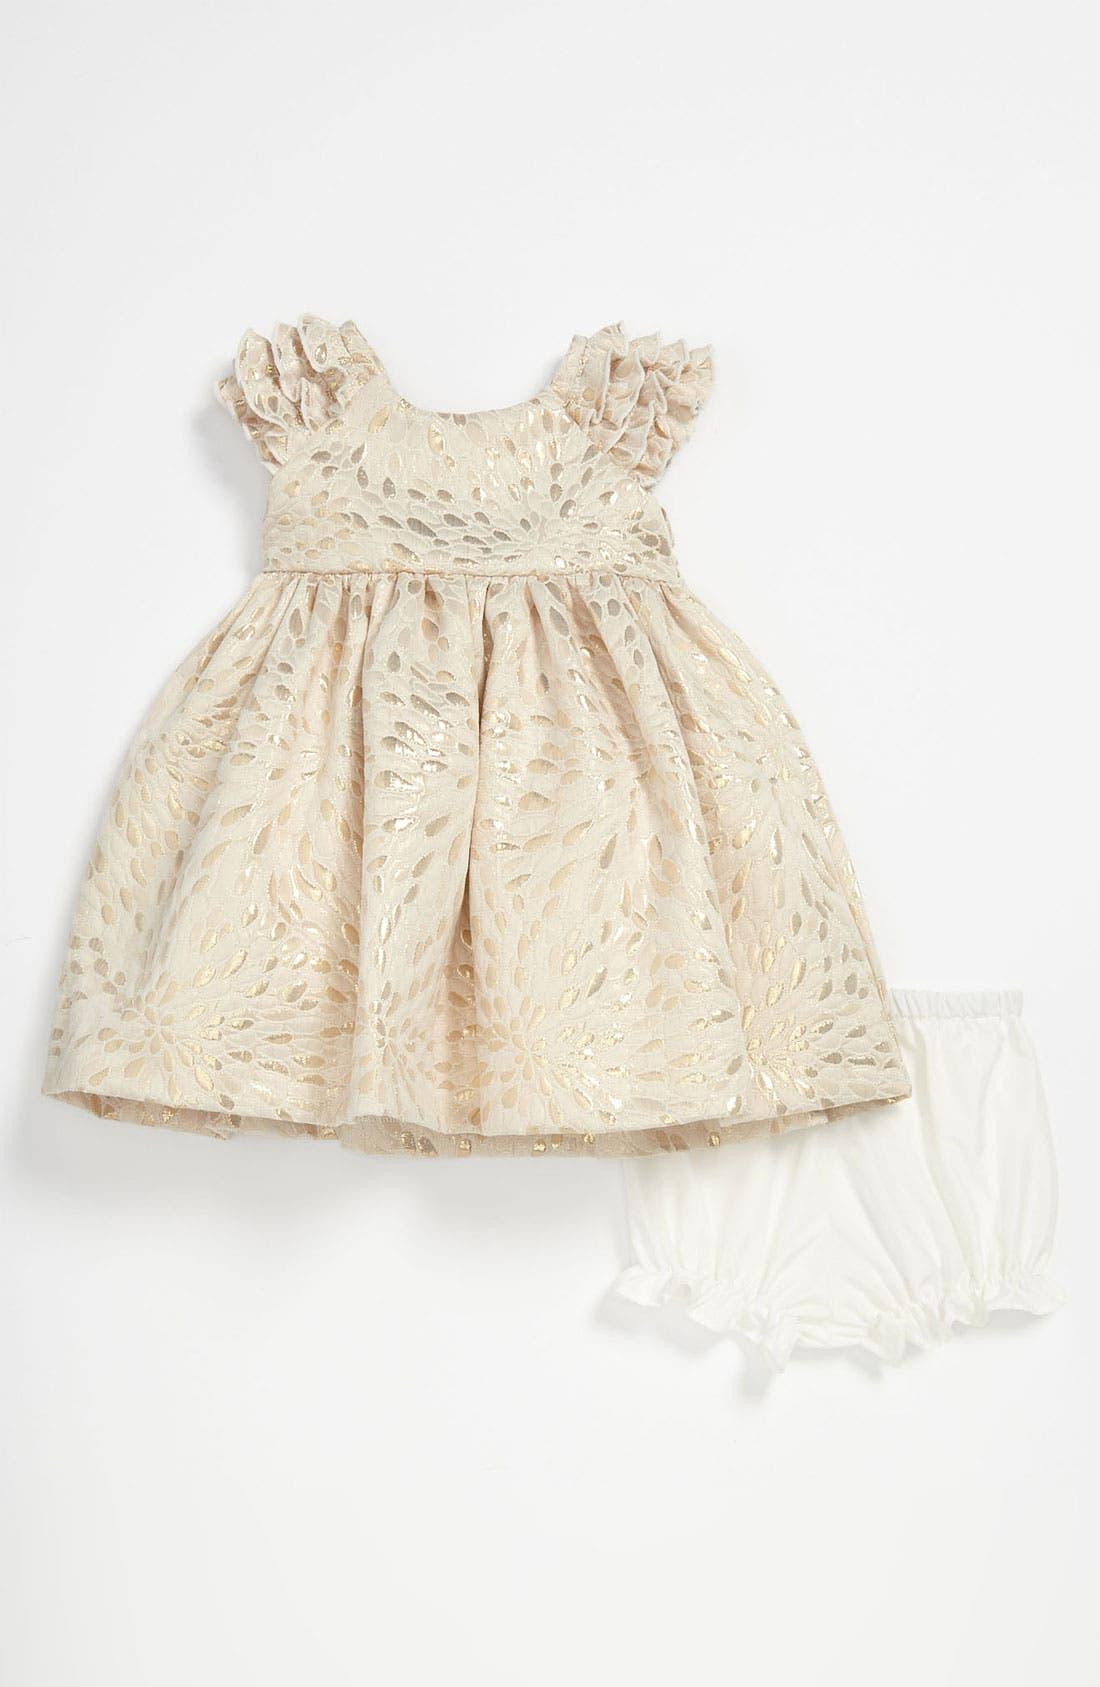 Alternate Image 1 Selected - Laura Ashley Brocade Dress & Bloomers (Infant)